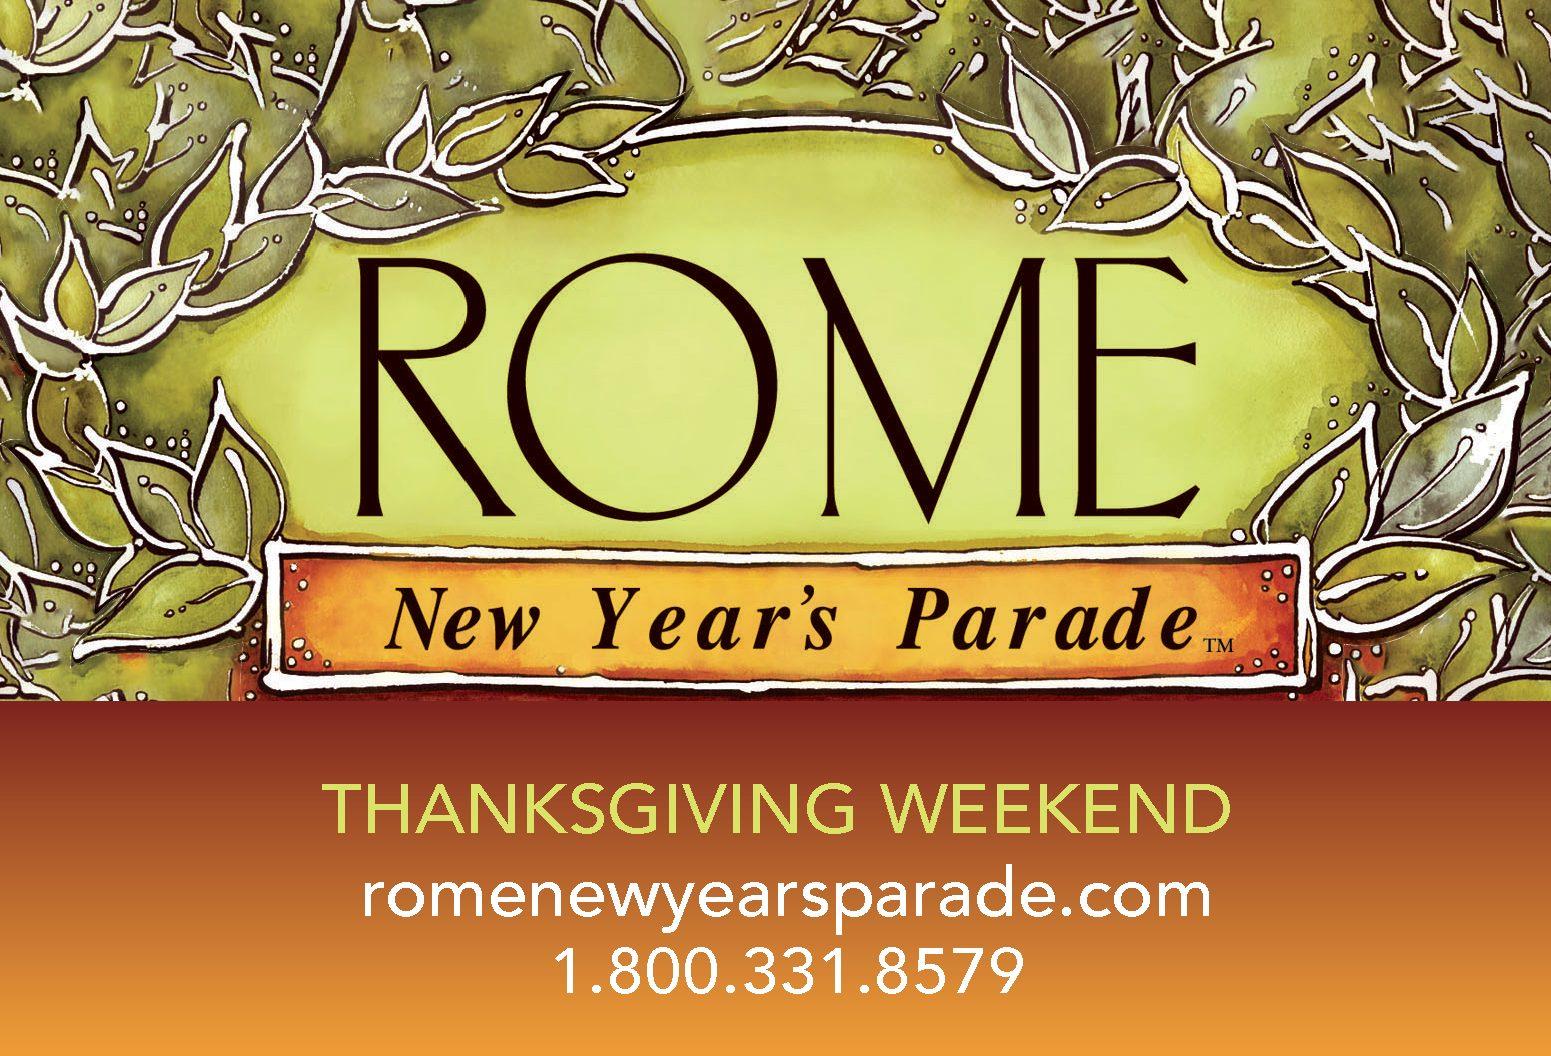 Gateway Rome Parade – Parades Lower Ads Col1